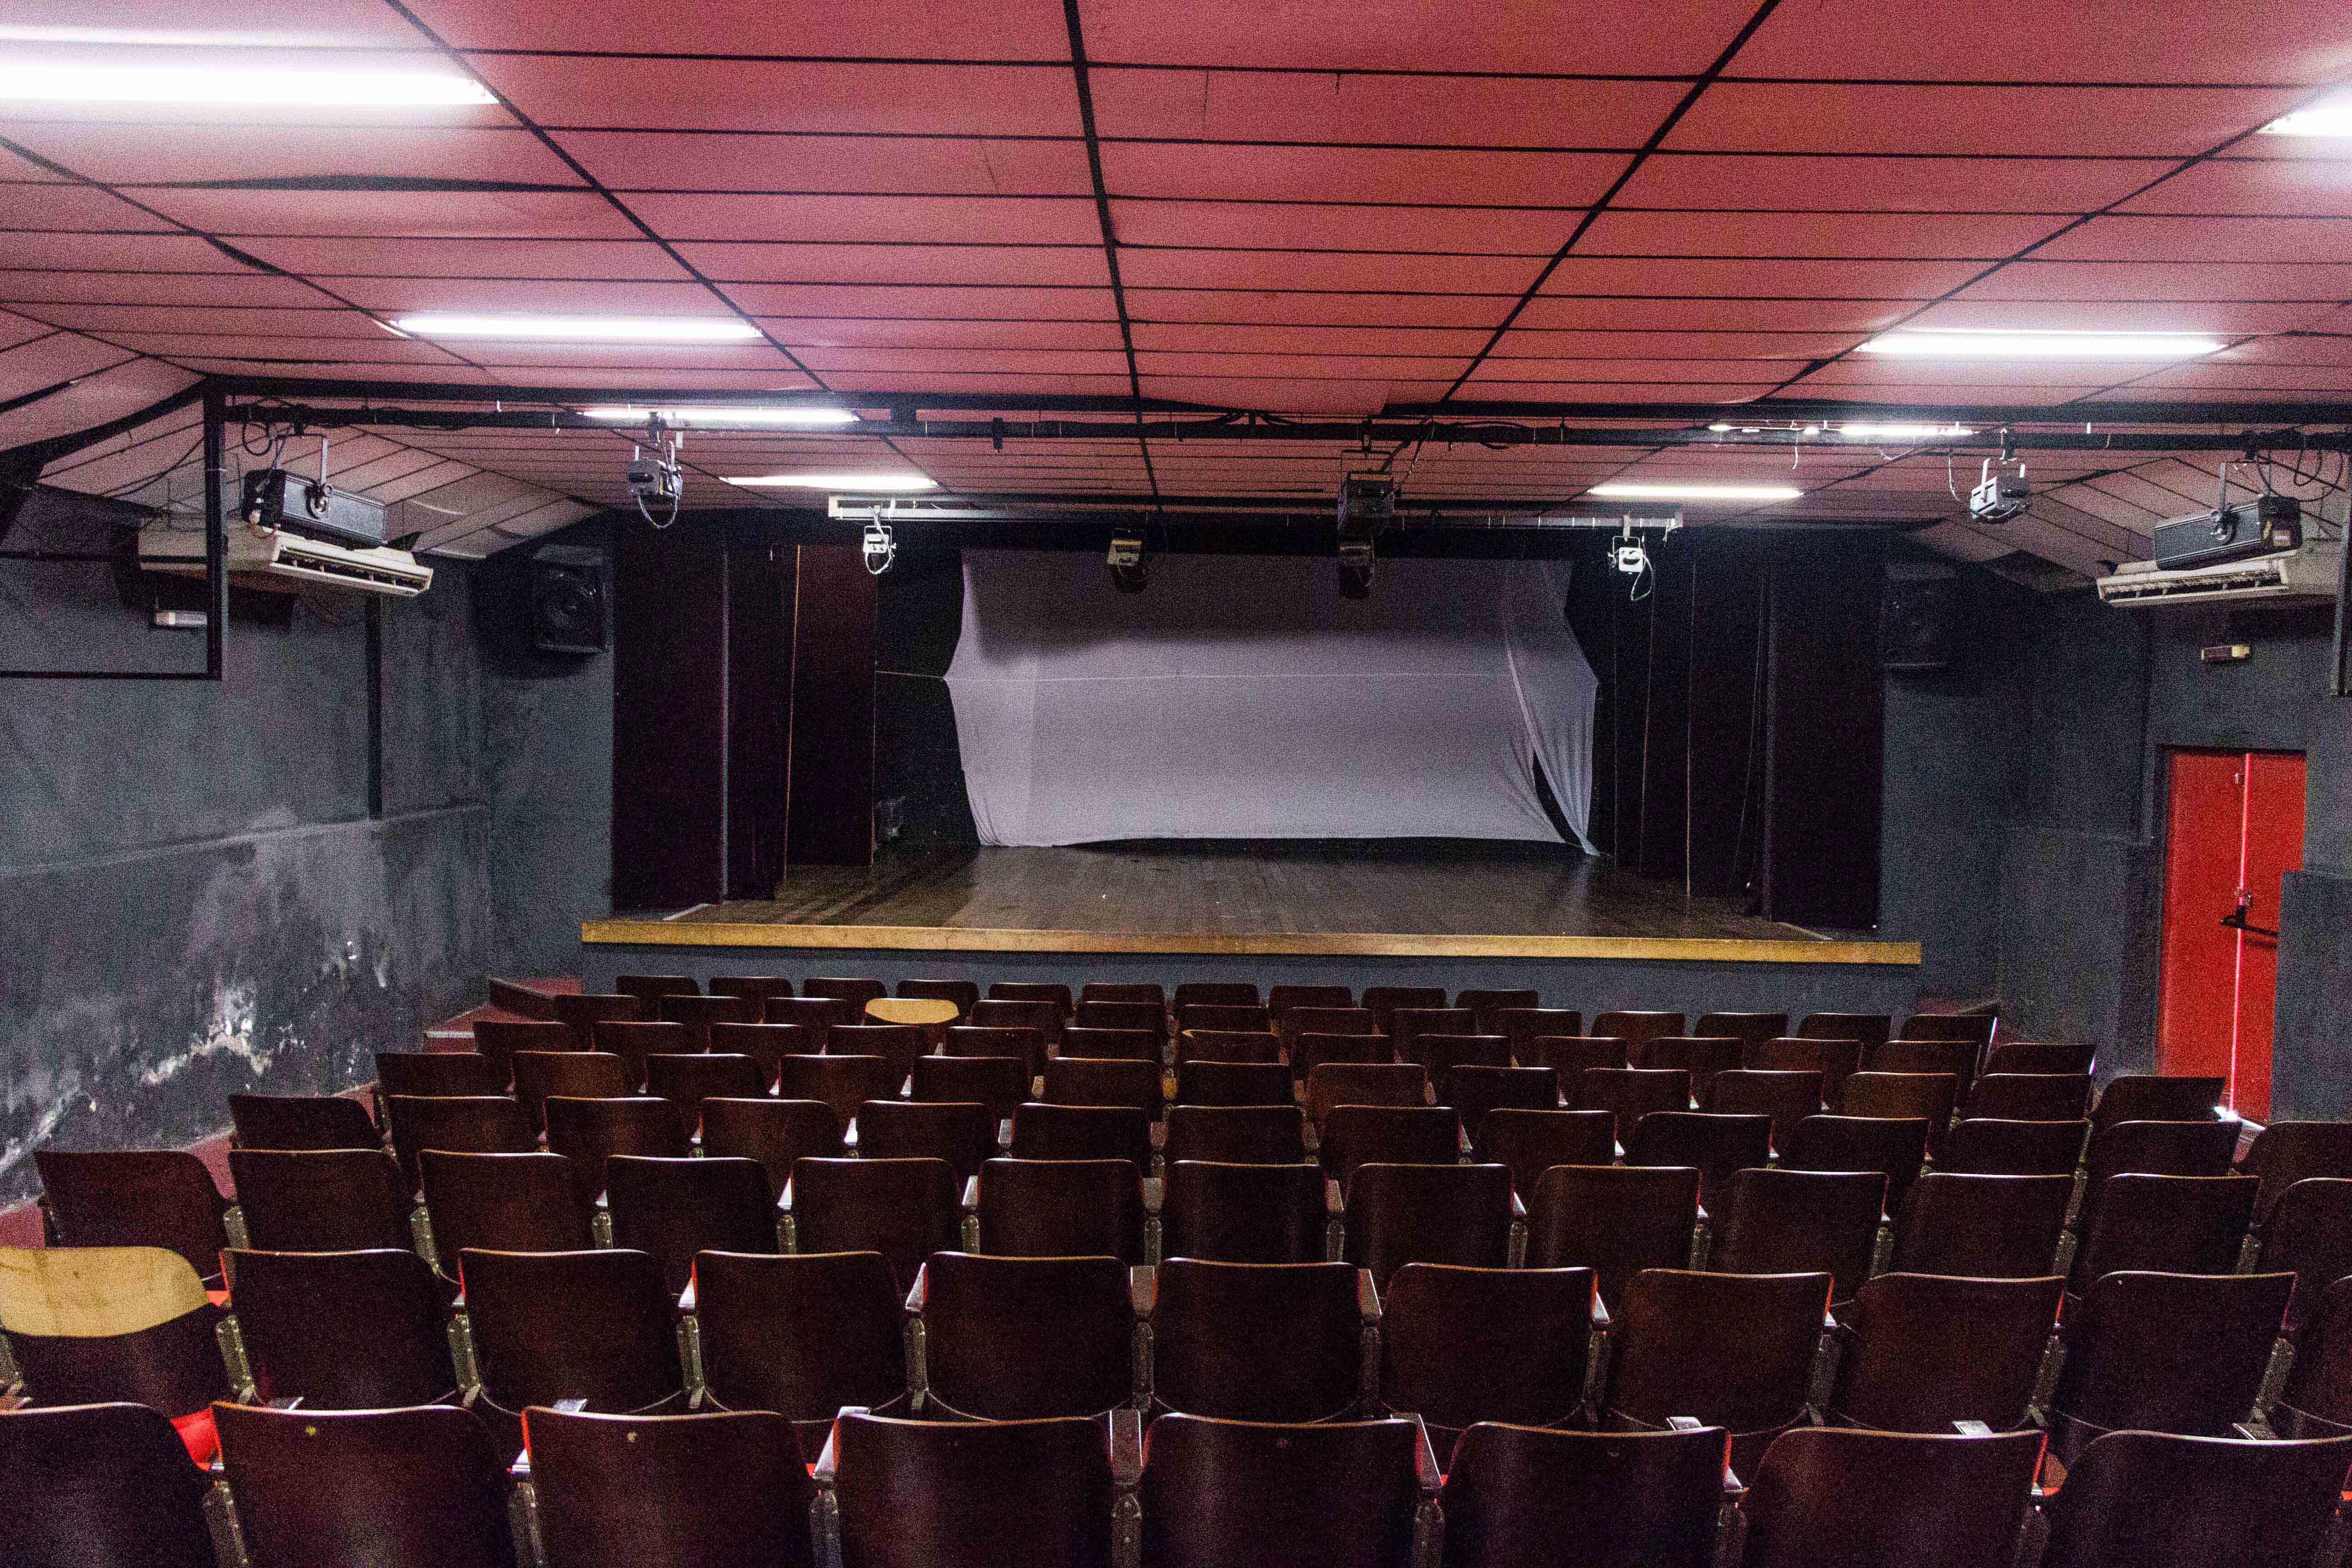 Teatro Mário Lago passa por dificuldades - Foto: Renato Moura/Jornal Voz Das Comunidades